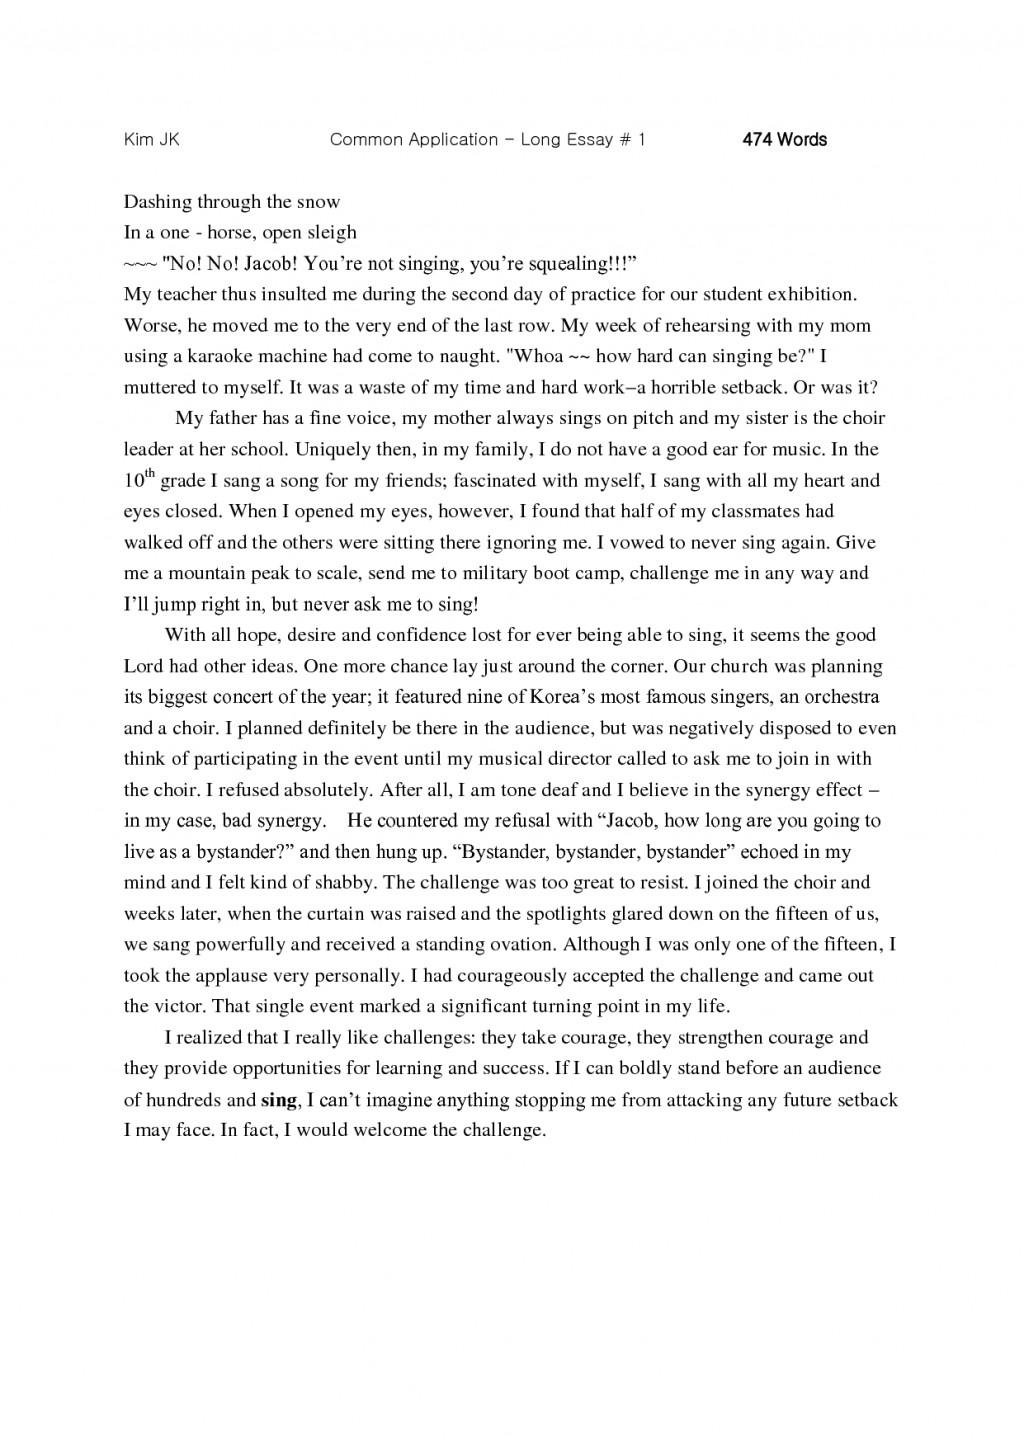 001 College Essay Word Limit Good Common App Essays Resume Writing Application Help Cnessayjuvi Impressive Count Admission 2019 Large